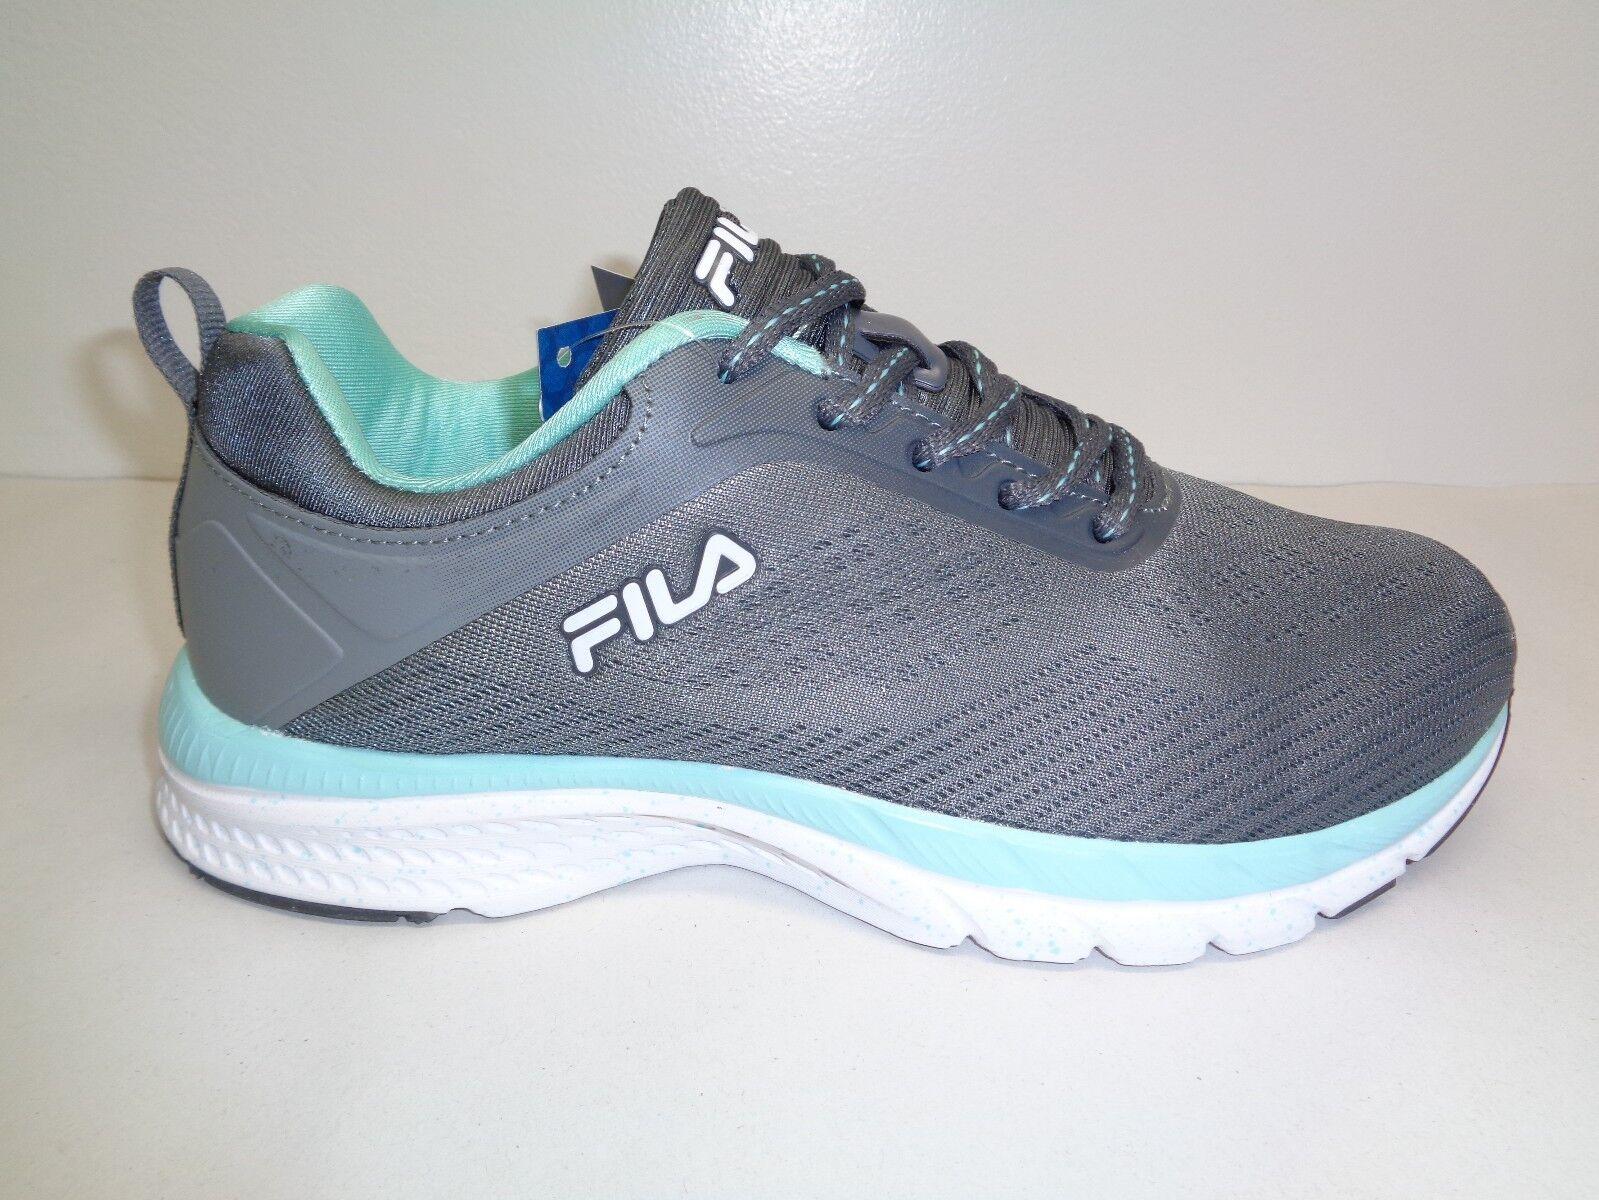 Fila Größe 8 MEMORY OUTREACH Grau Running Athletic Sneakers NEU Damenschuhe Schuhes